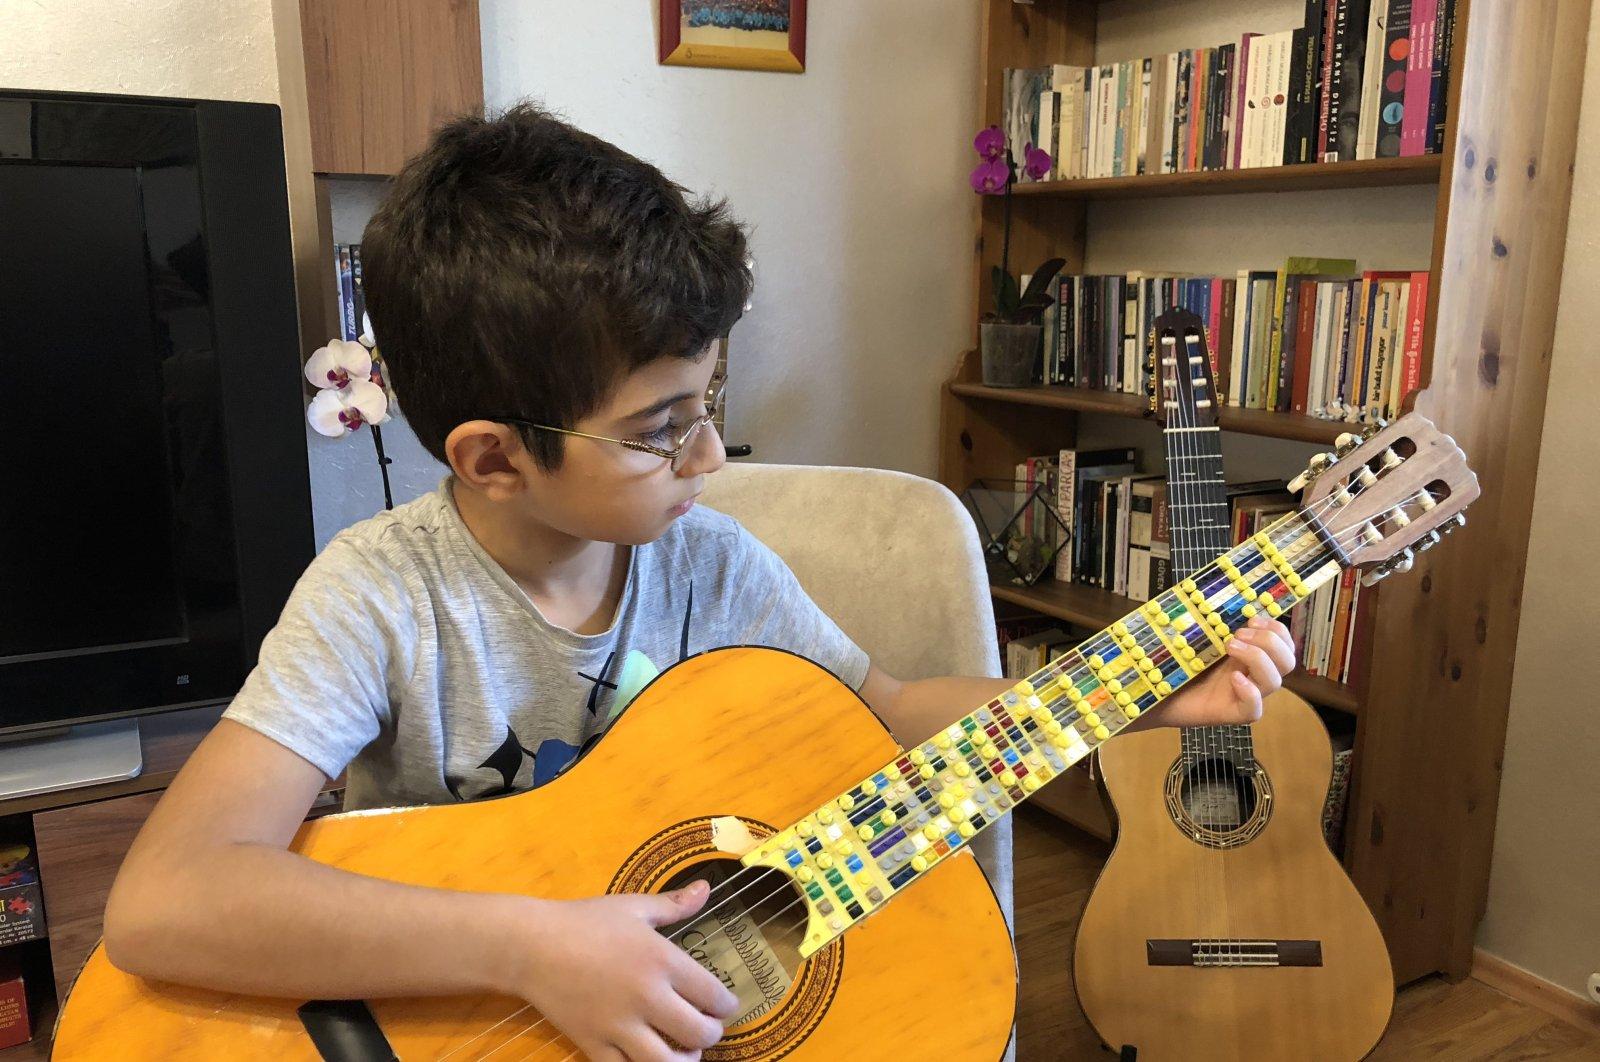 Atlas Çoğulu plays his Lego Microtonal Guitar.